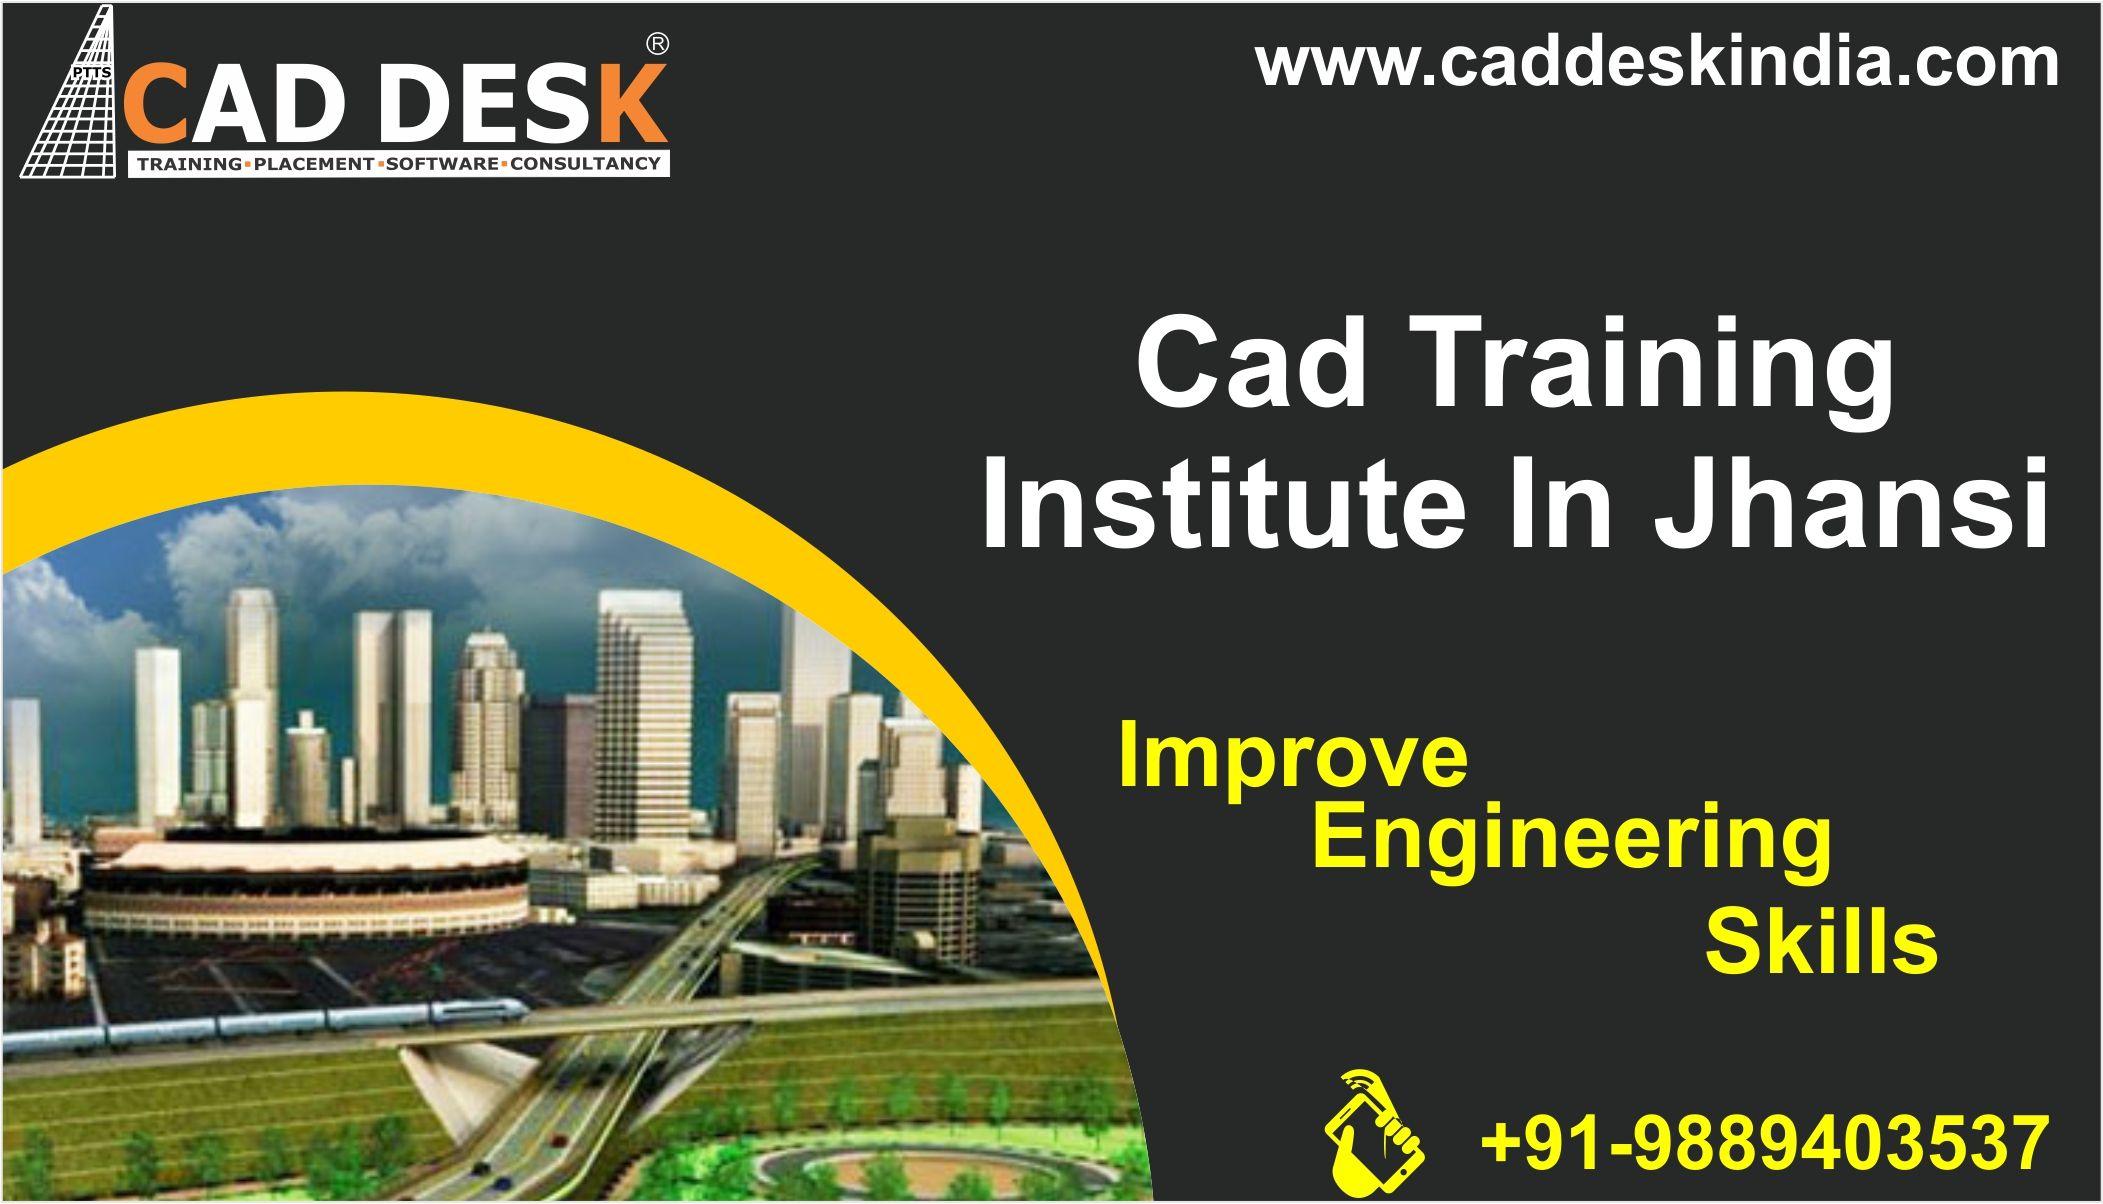 CAD DESK Jhansi is Best AutoCad Training Institute in Jhansi